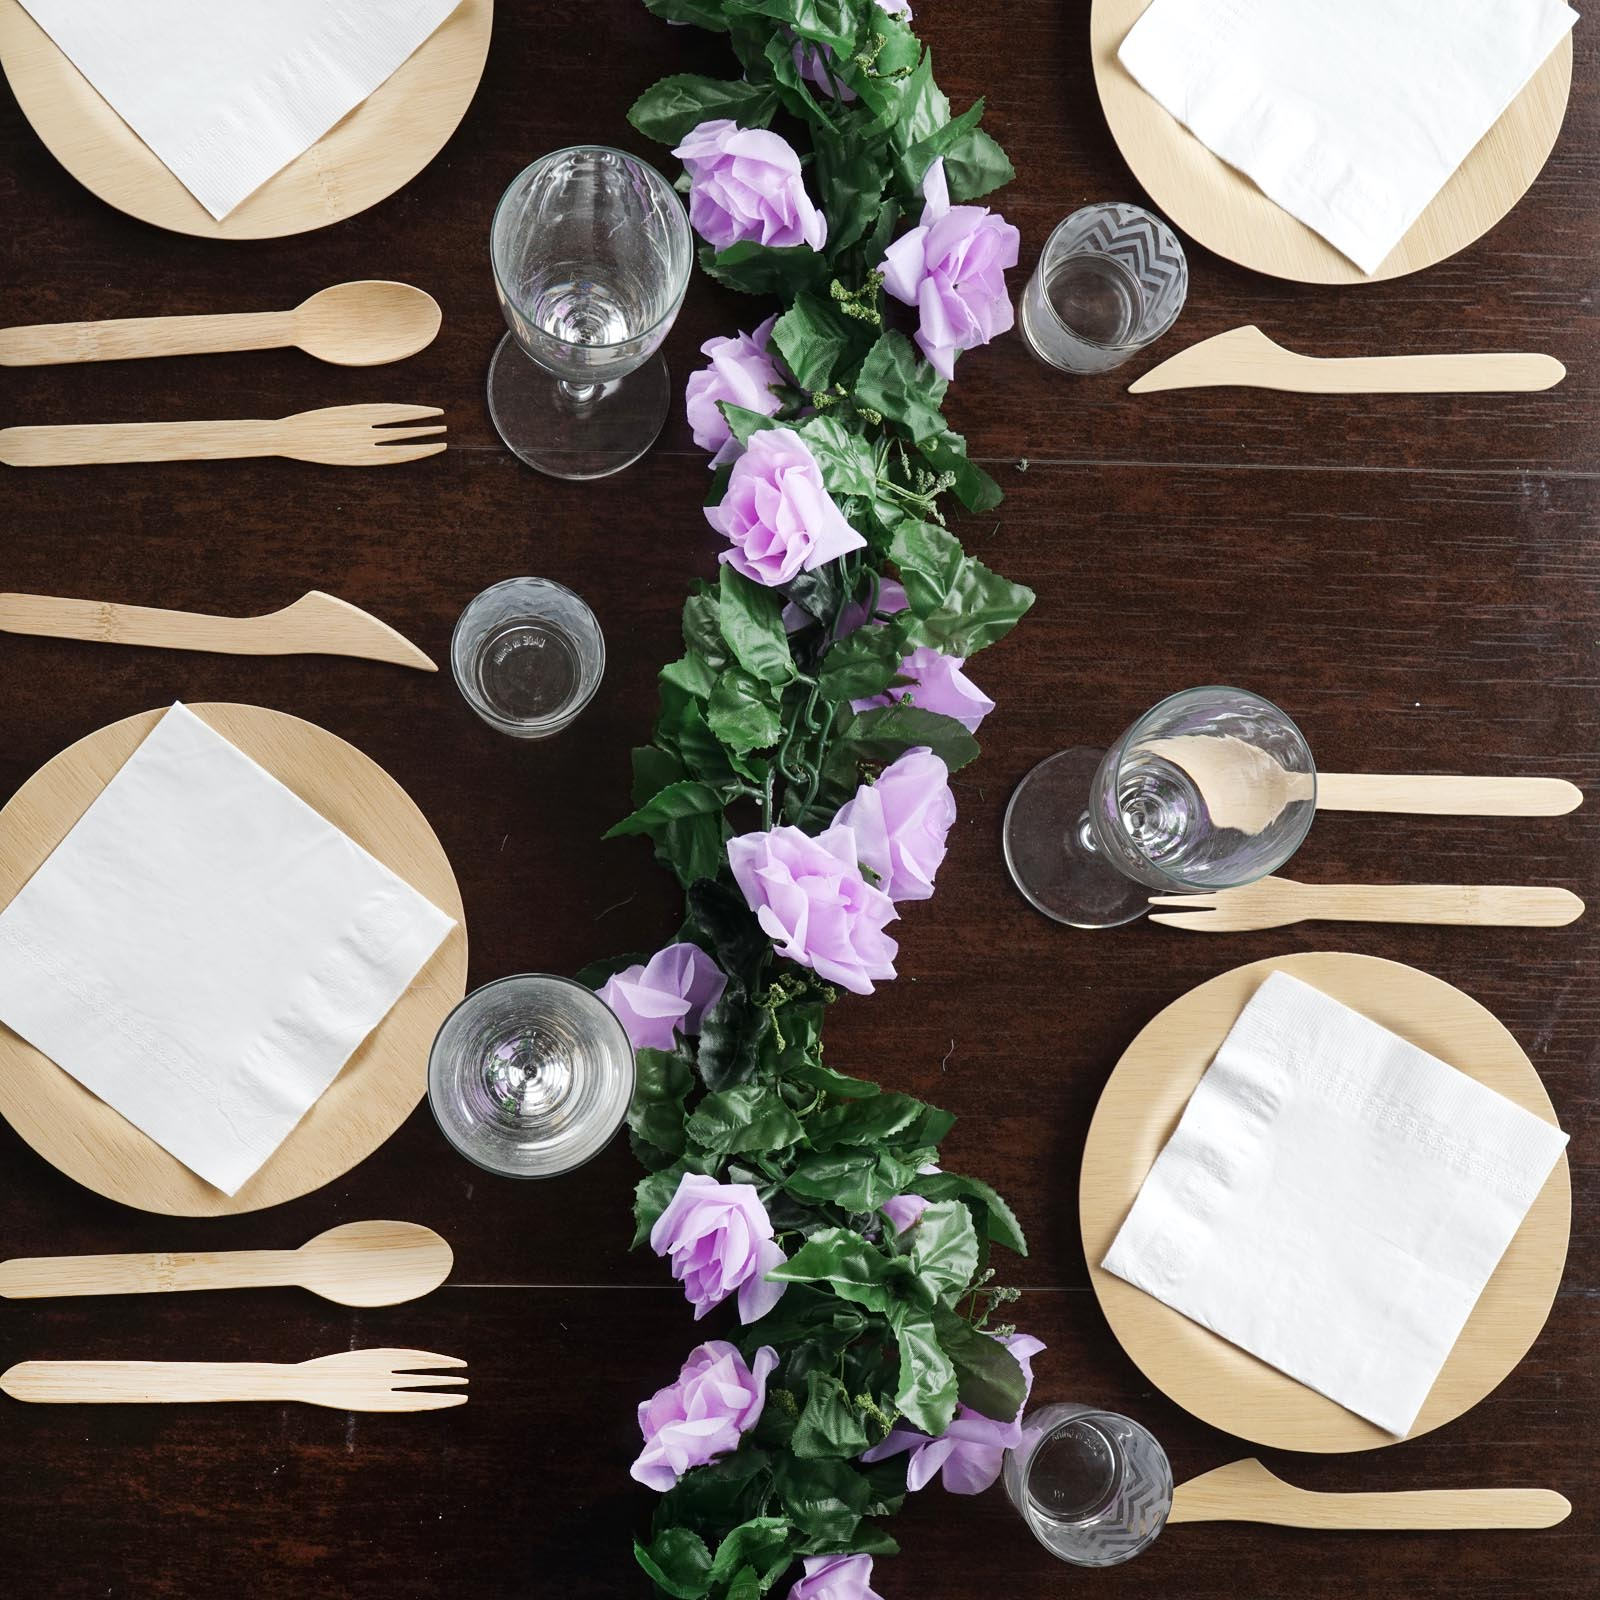 Efavormart 6 FT Long 3D Chain Artificial Rose Garlands Wedding Supply for DIY Wedding Arrangements Party Baby Shower Decorations